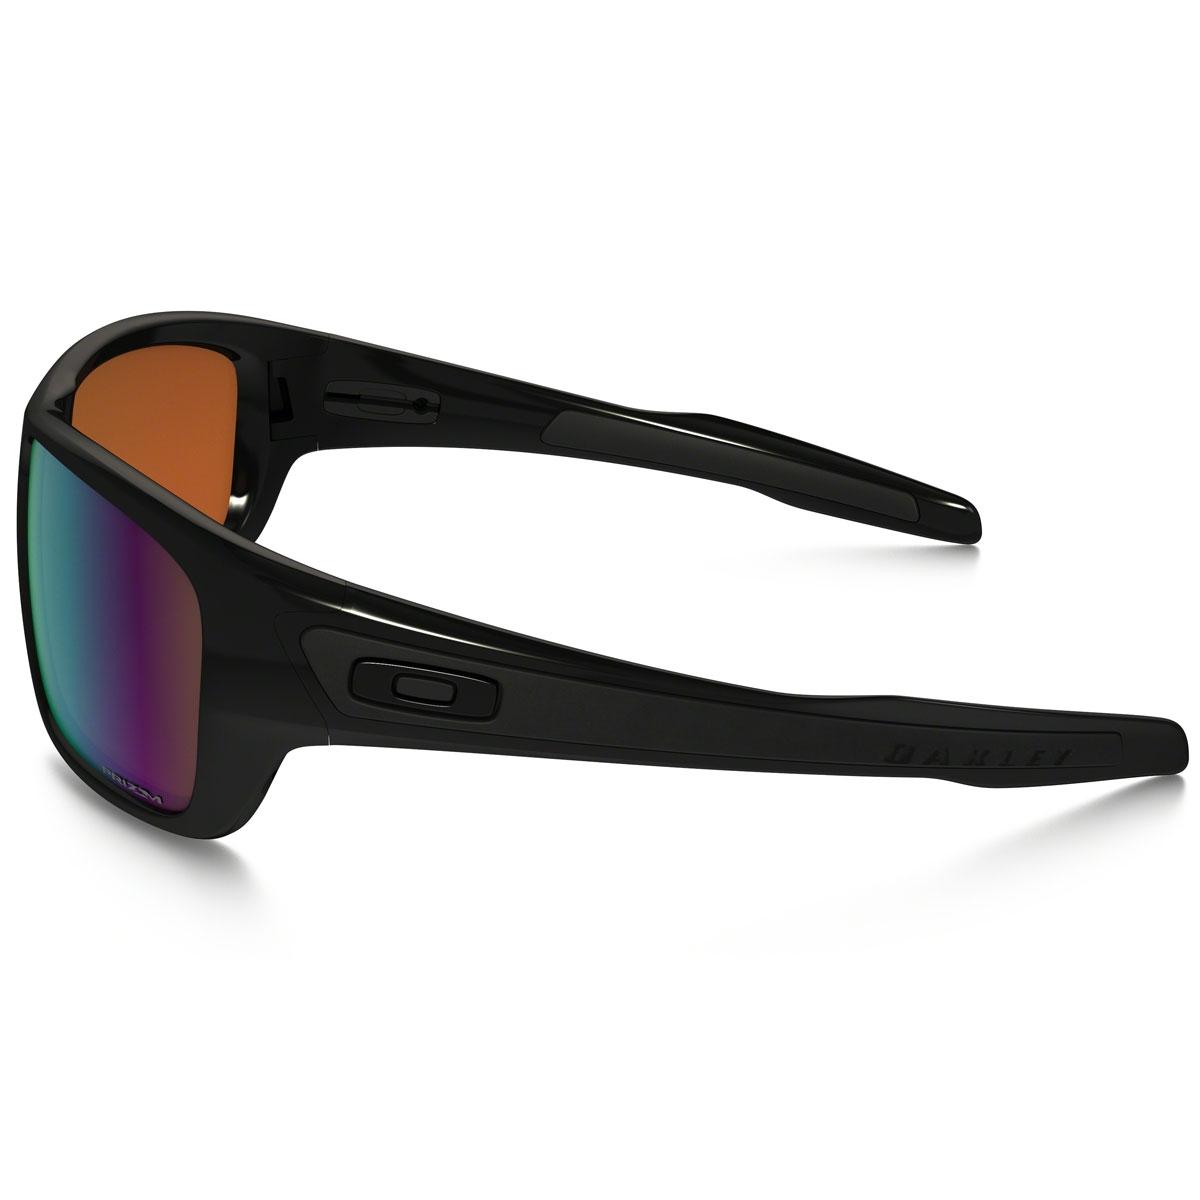 ifpvx Oakley Turbine Sunglasses - Polished Black / Prizm Shallow Water